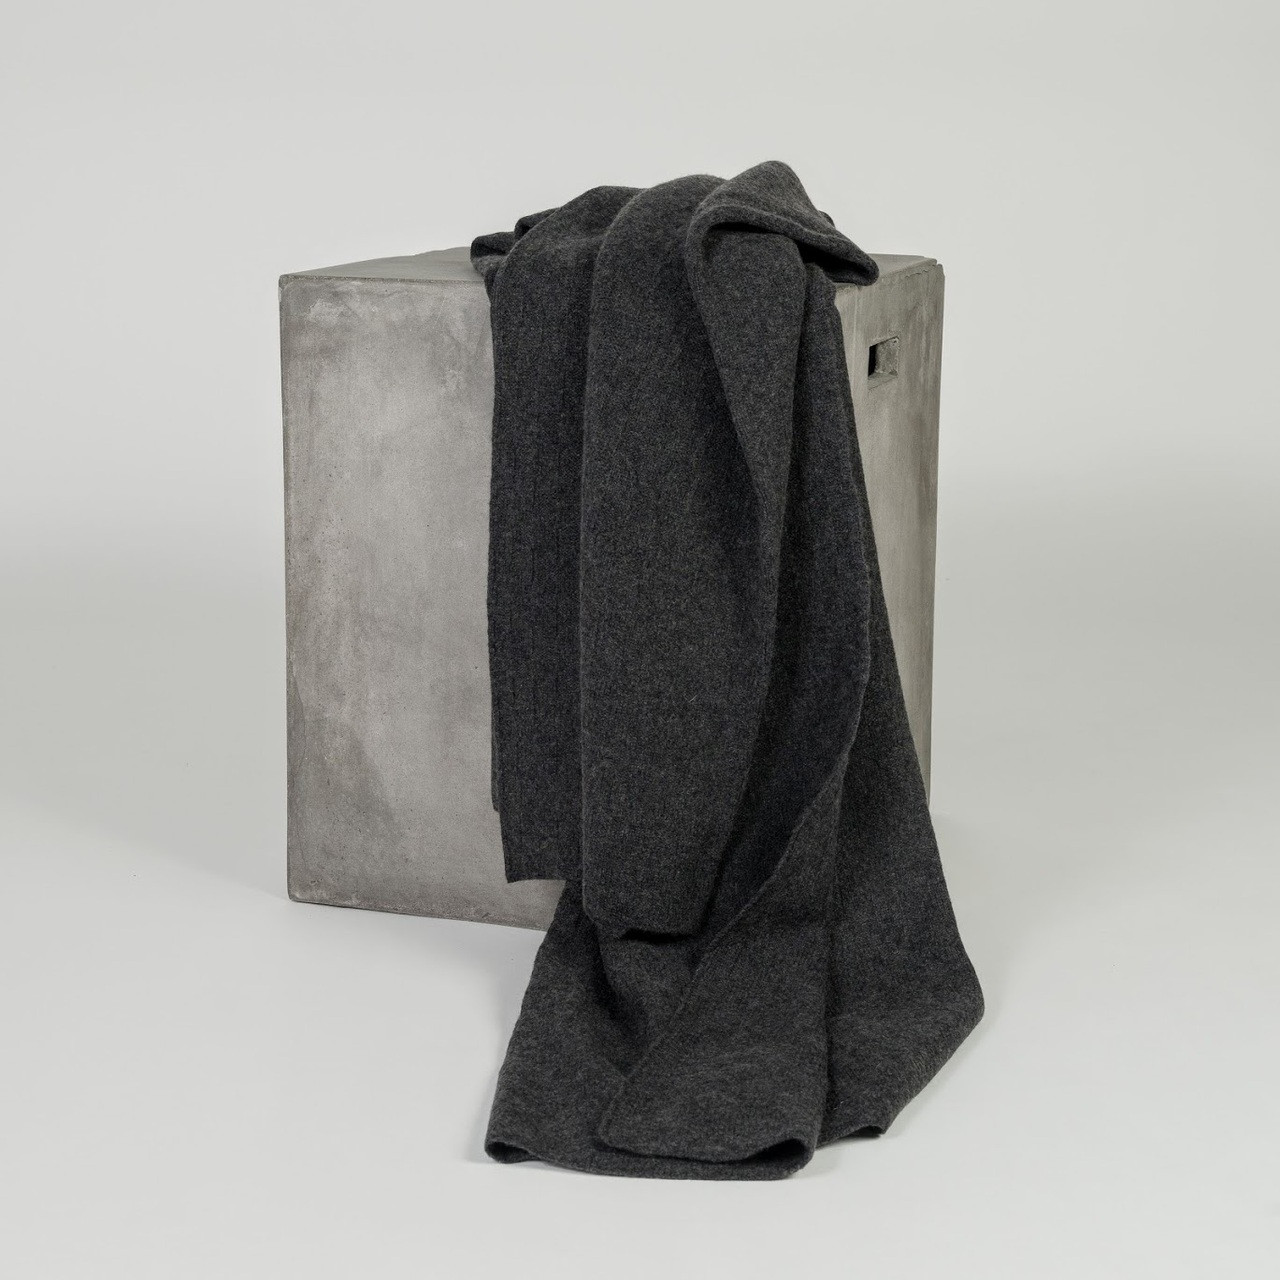 Organic Charcoal Diamond Lattice Knit Cashmere Throw